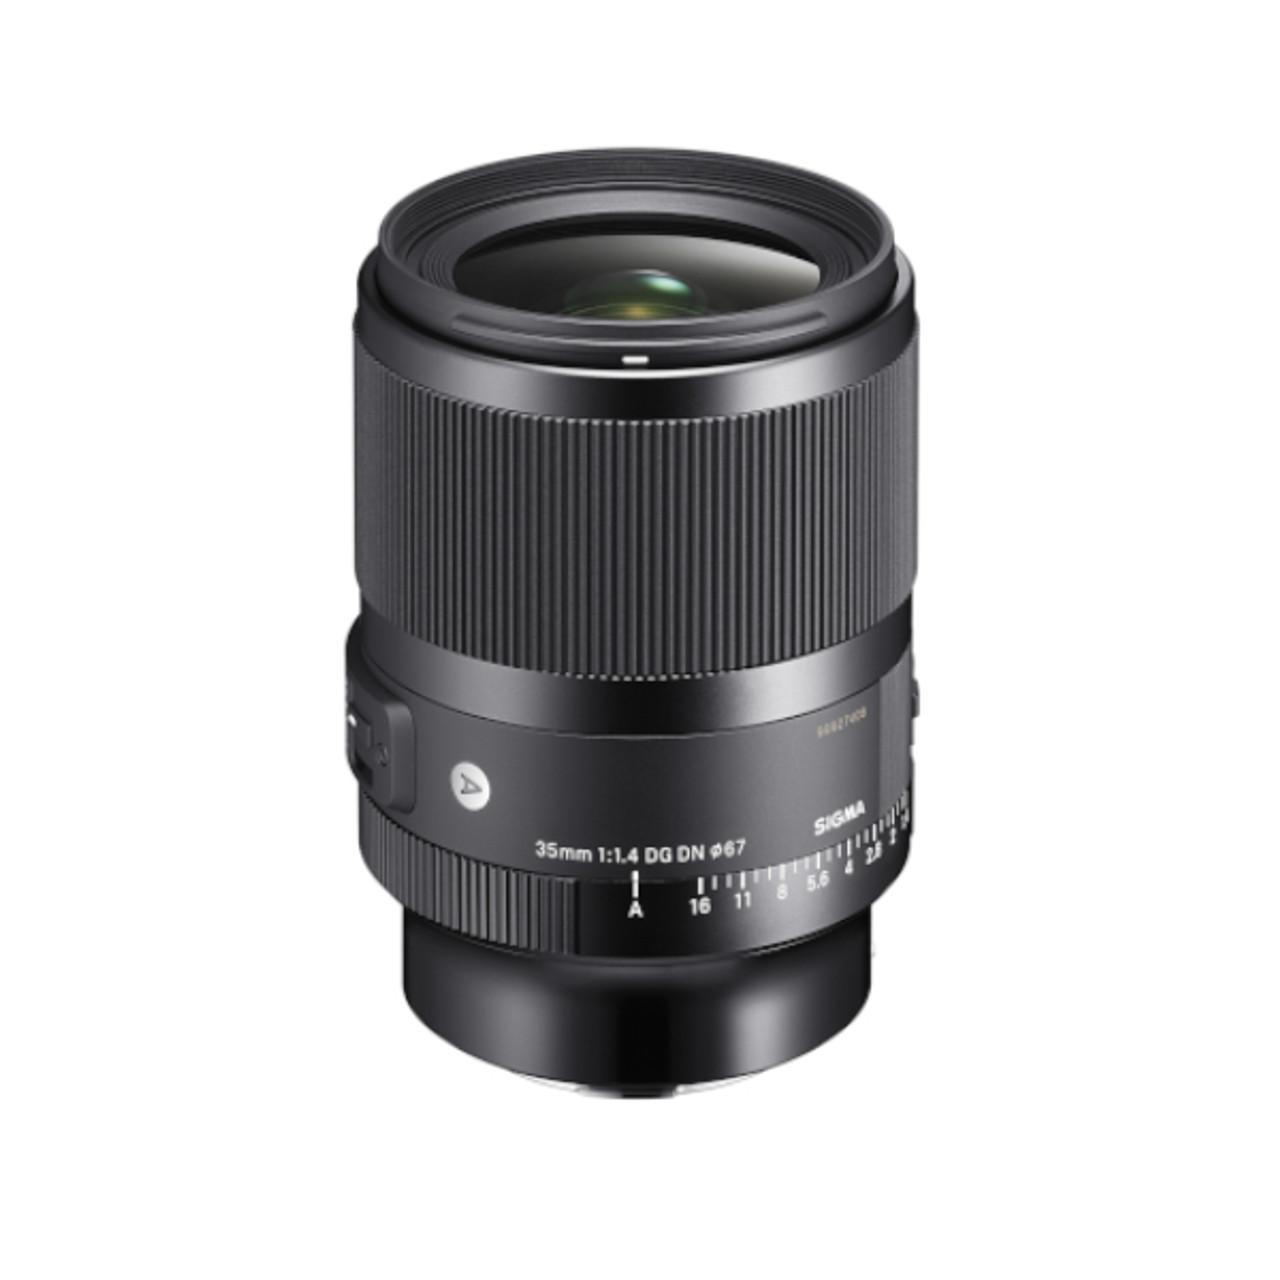 Sigma 35mm F1.4 Art DG DN E-mount